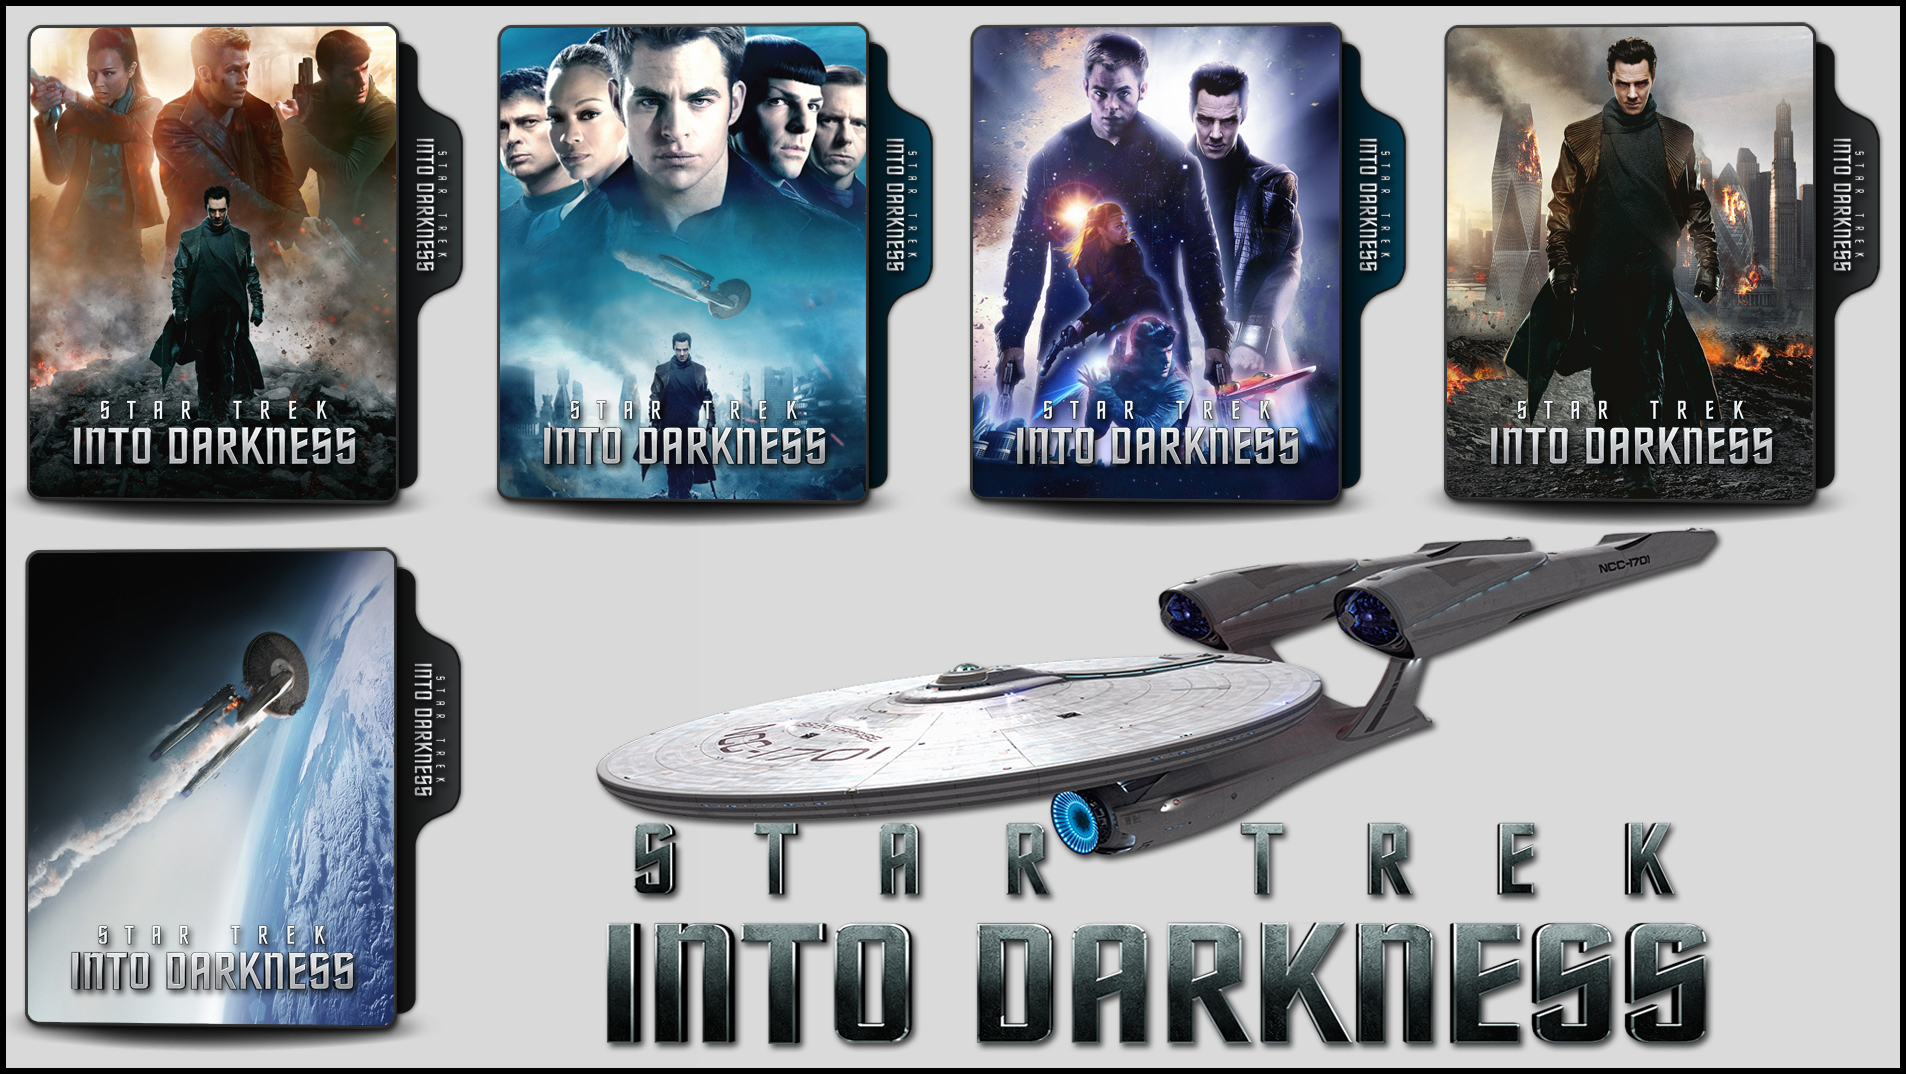 Star Trek Into Darkness 2013 Folder Icons By Onlystylematters On Deviantart